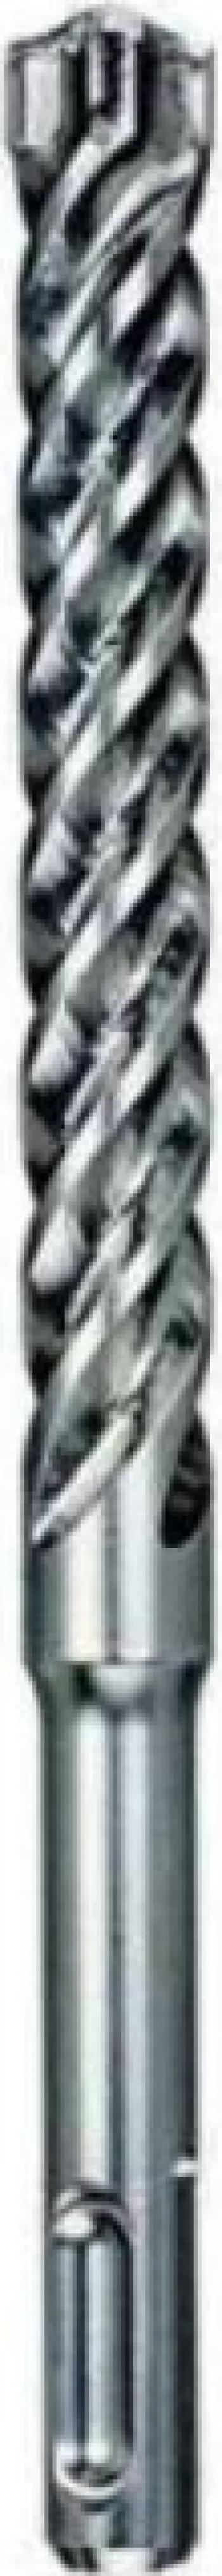 Burghiu Dewalt XLR SDS-plus 12 x 100 x 160 DT8933-QZ Accesorii masini de gaurit